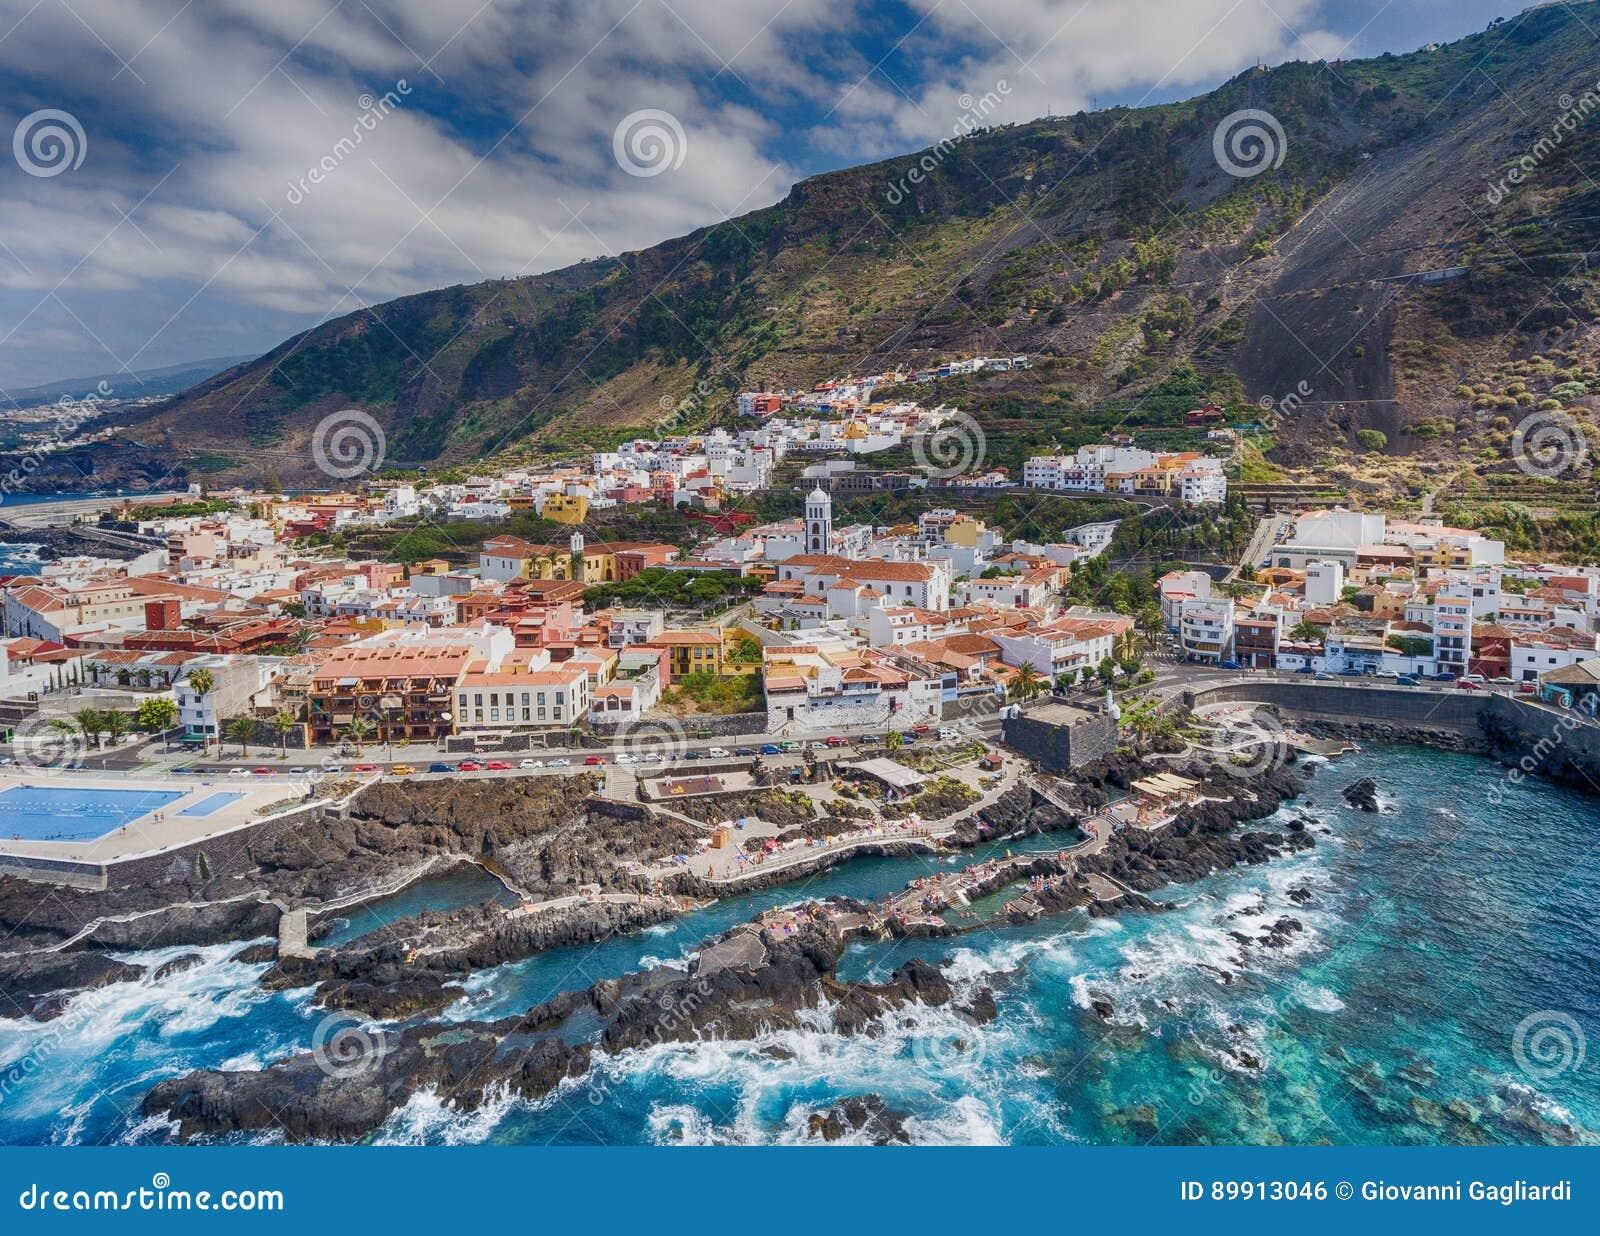 Famous Garachico Pools in Tenerife, Canary Islands - Spain